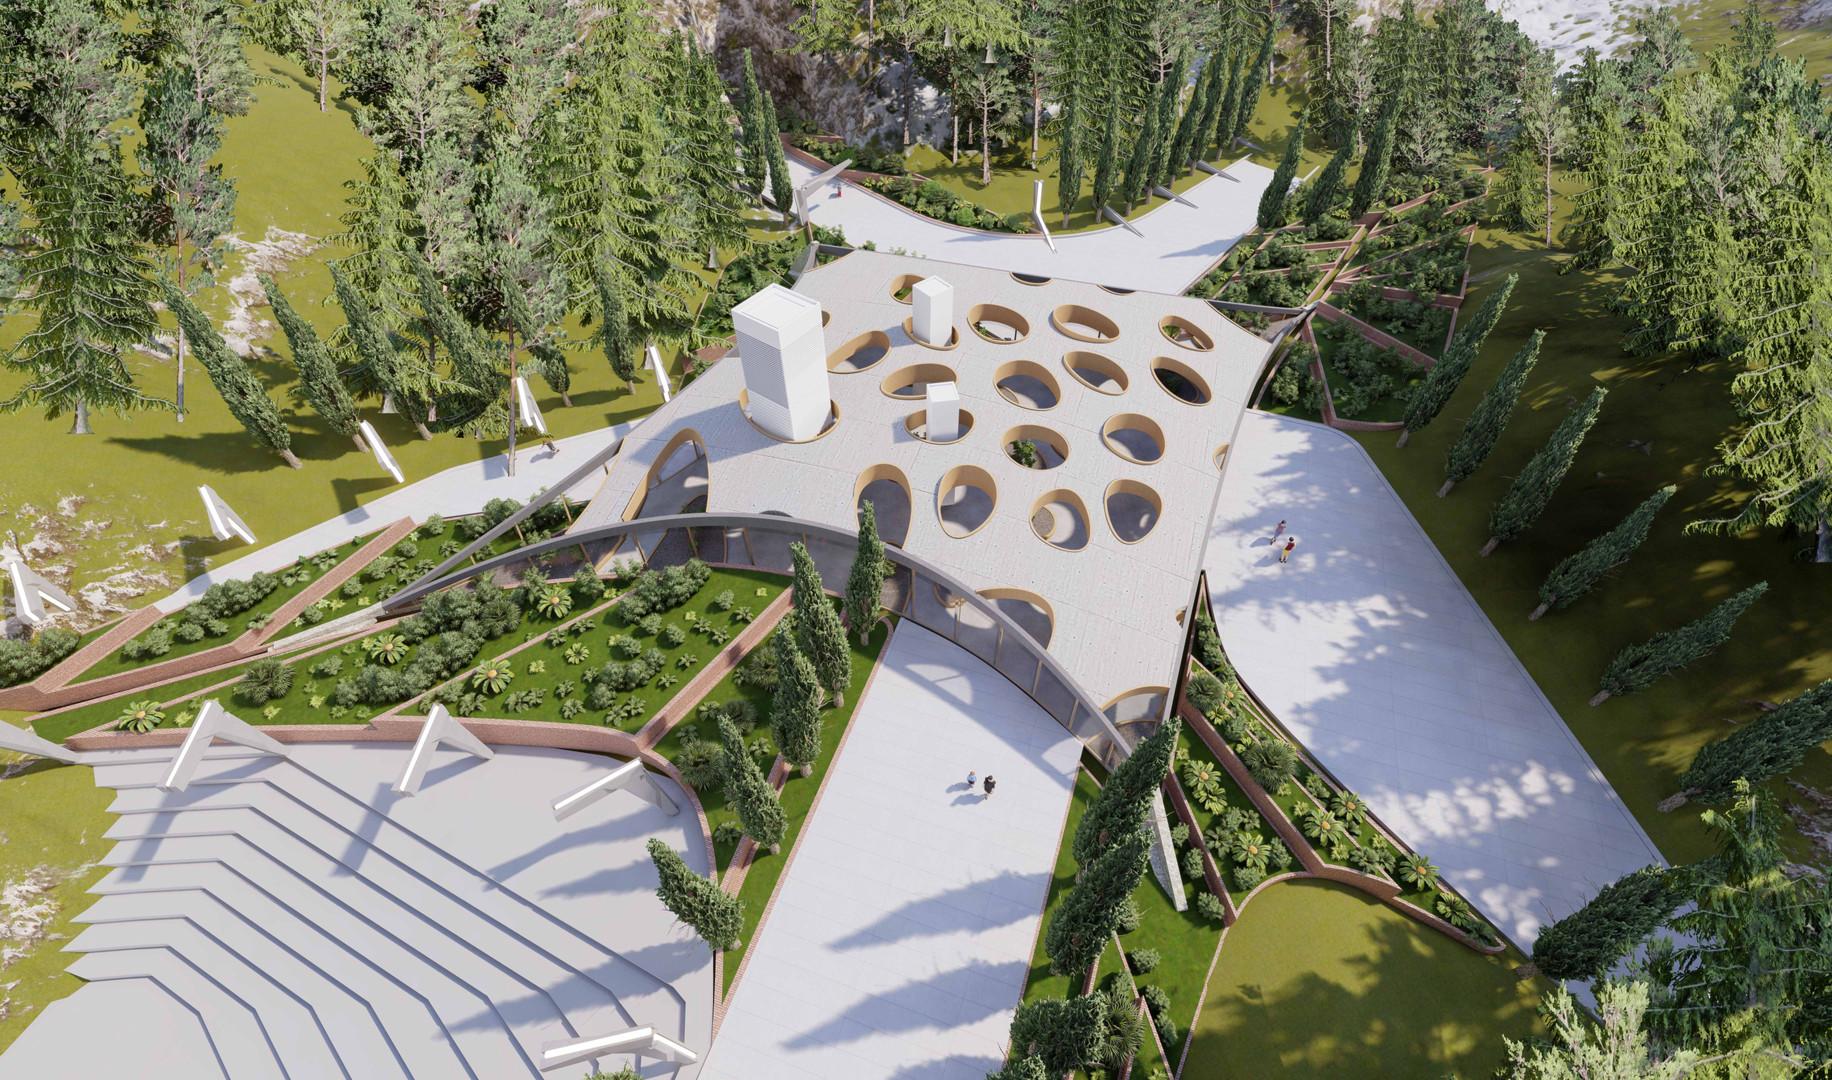 UNESCO_2020_Voronoi Seed Bank_2.jpg